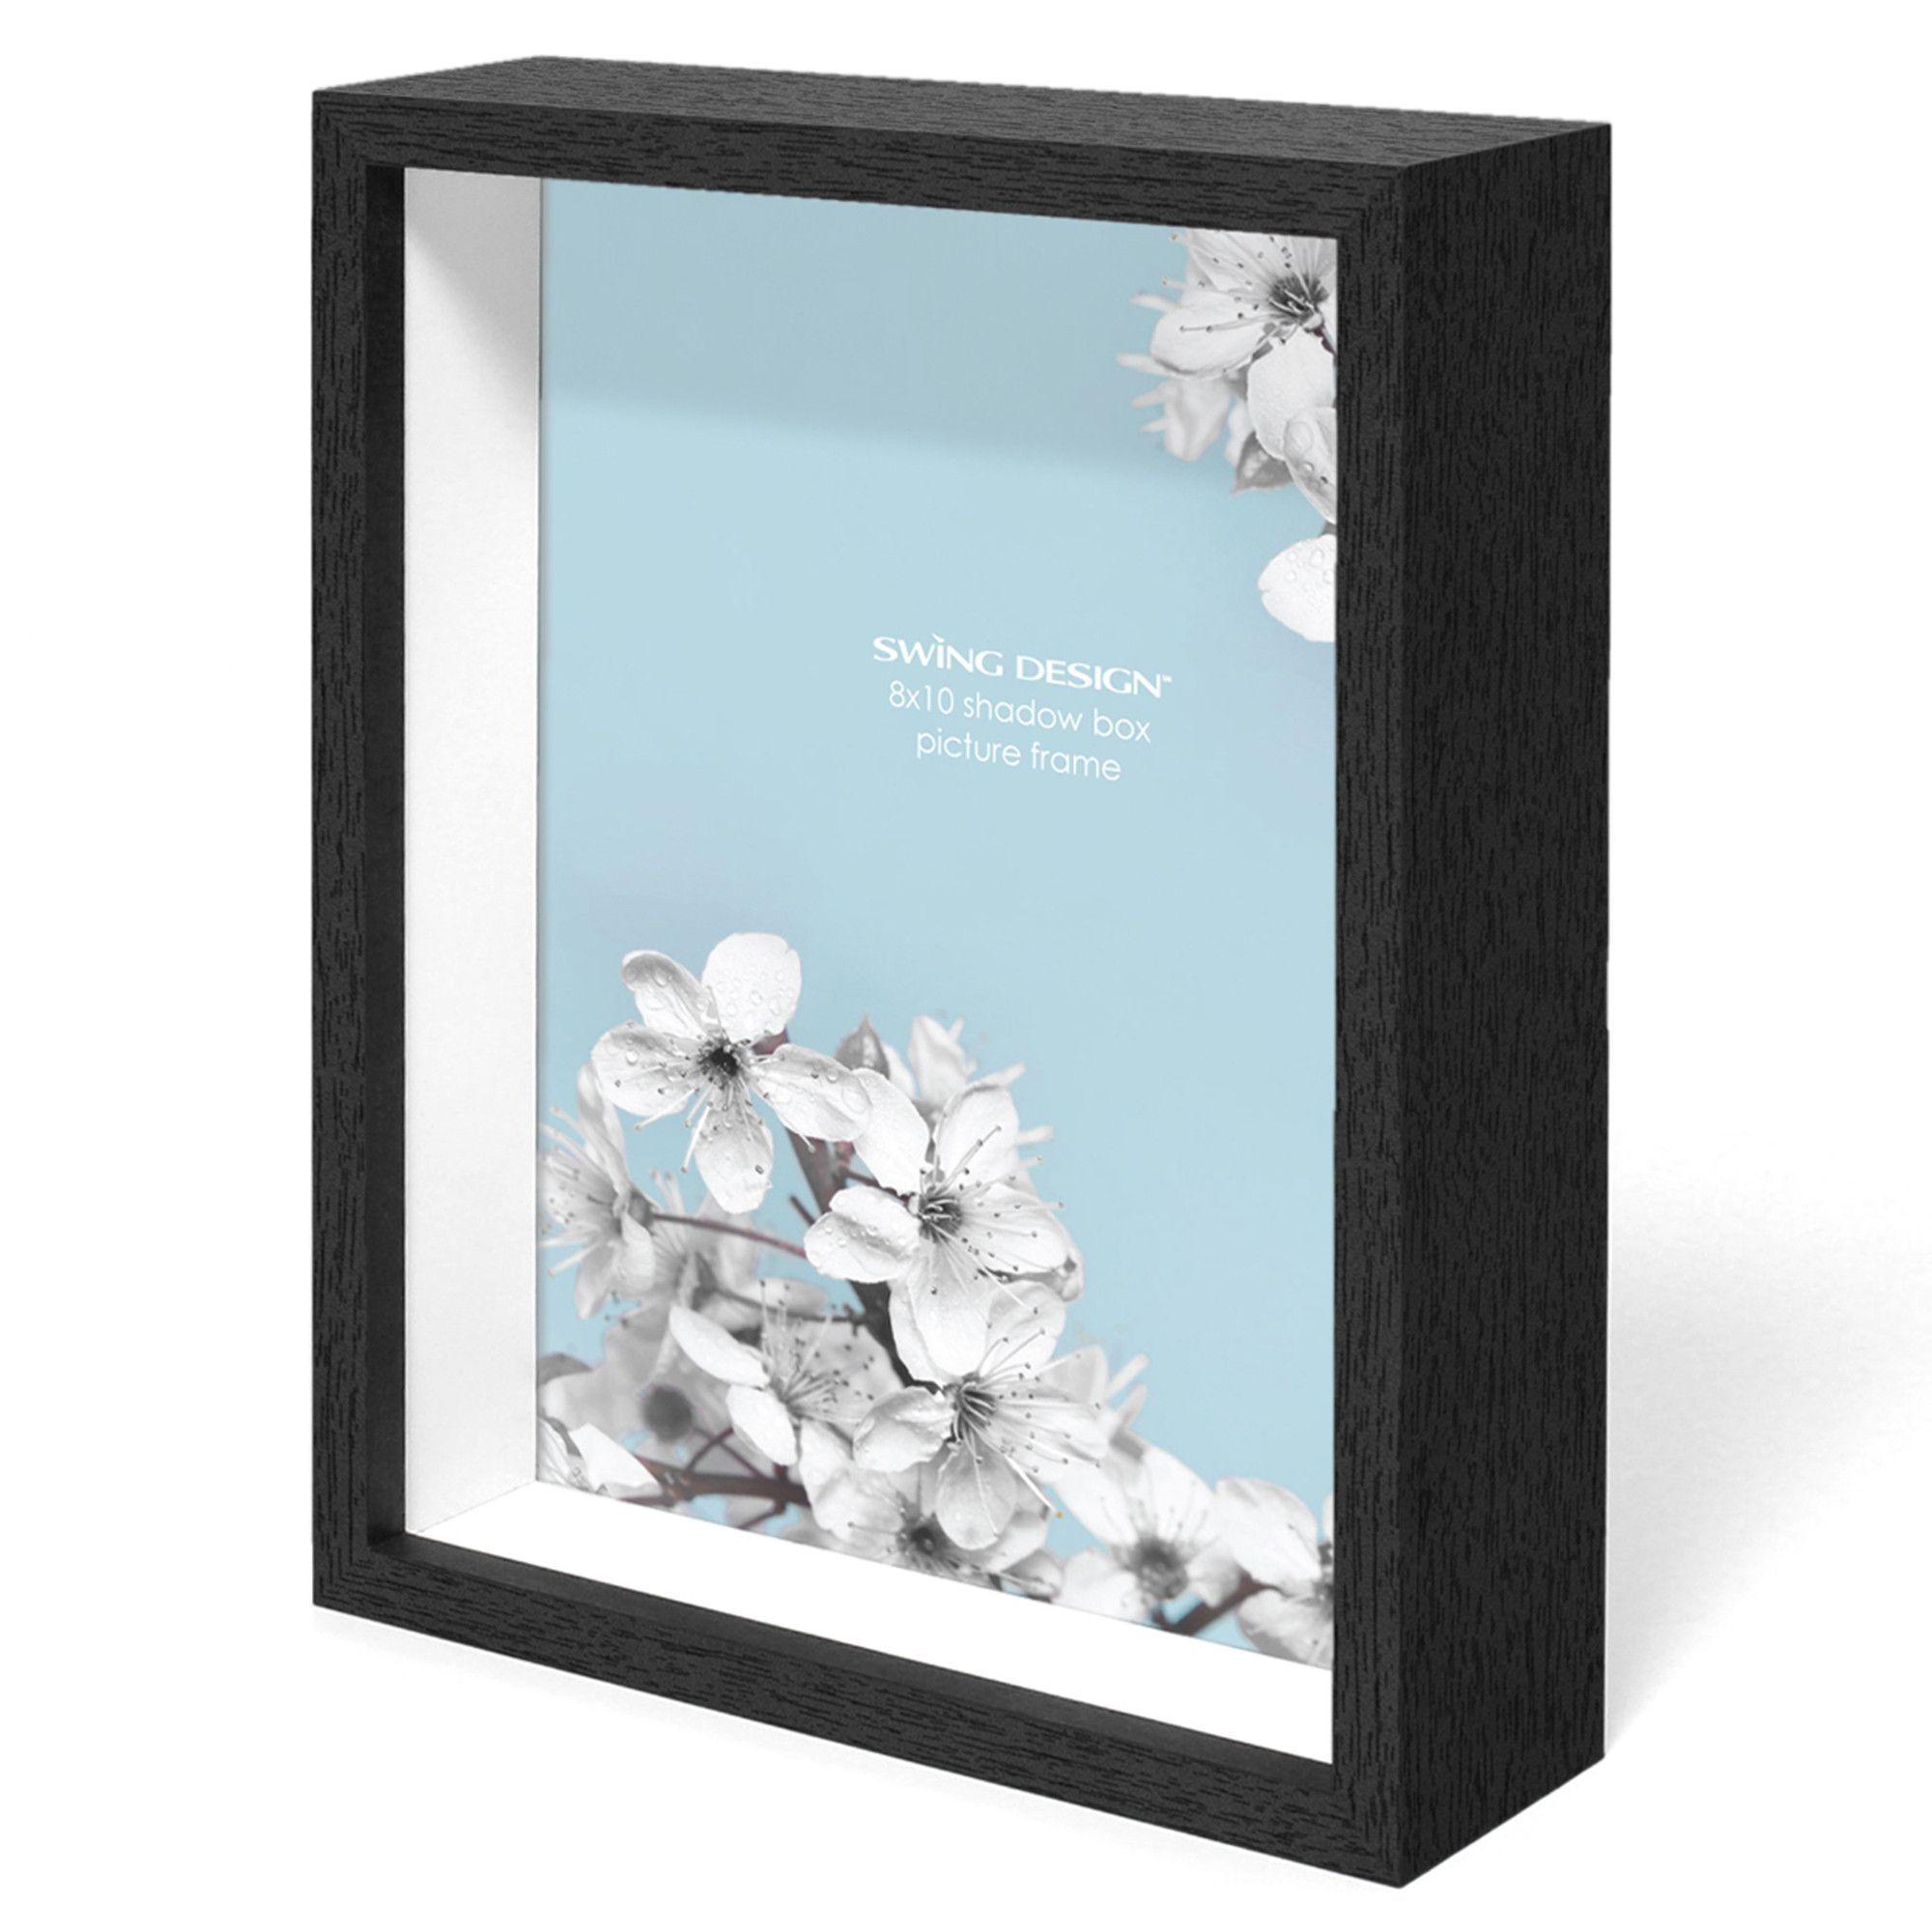 Chroma Shadow Box Frame Black 8x10 - Swing Design